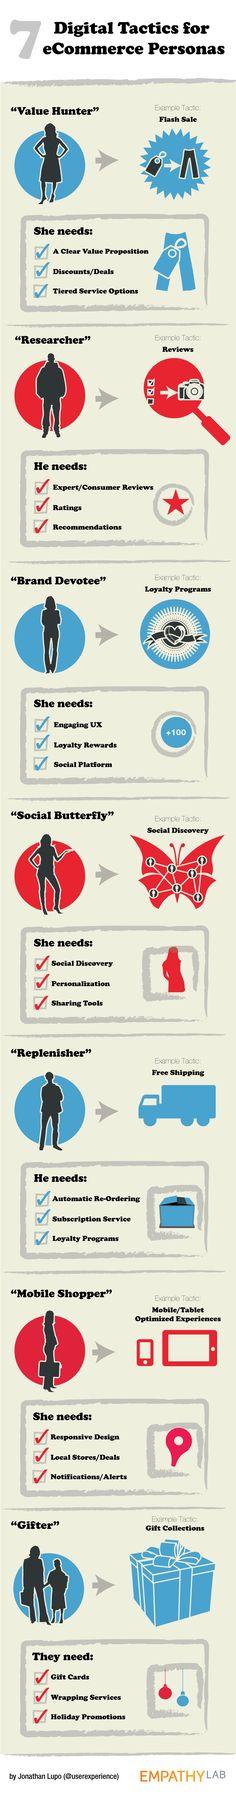 7 Digital Tactics for E-Commerce Personas #infographic